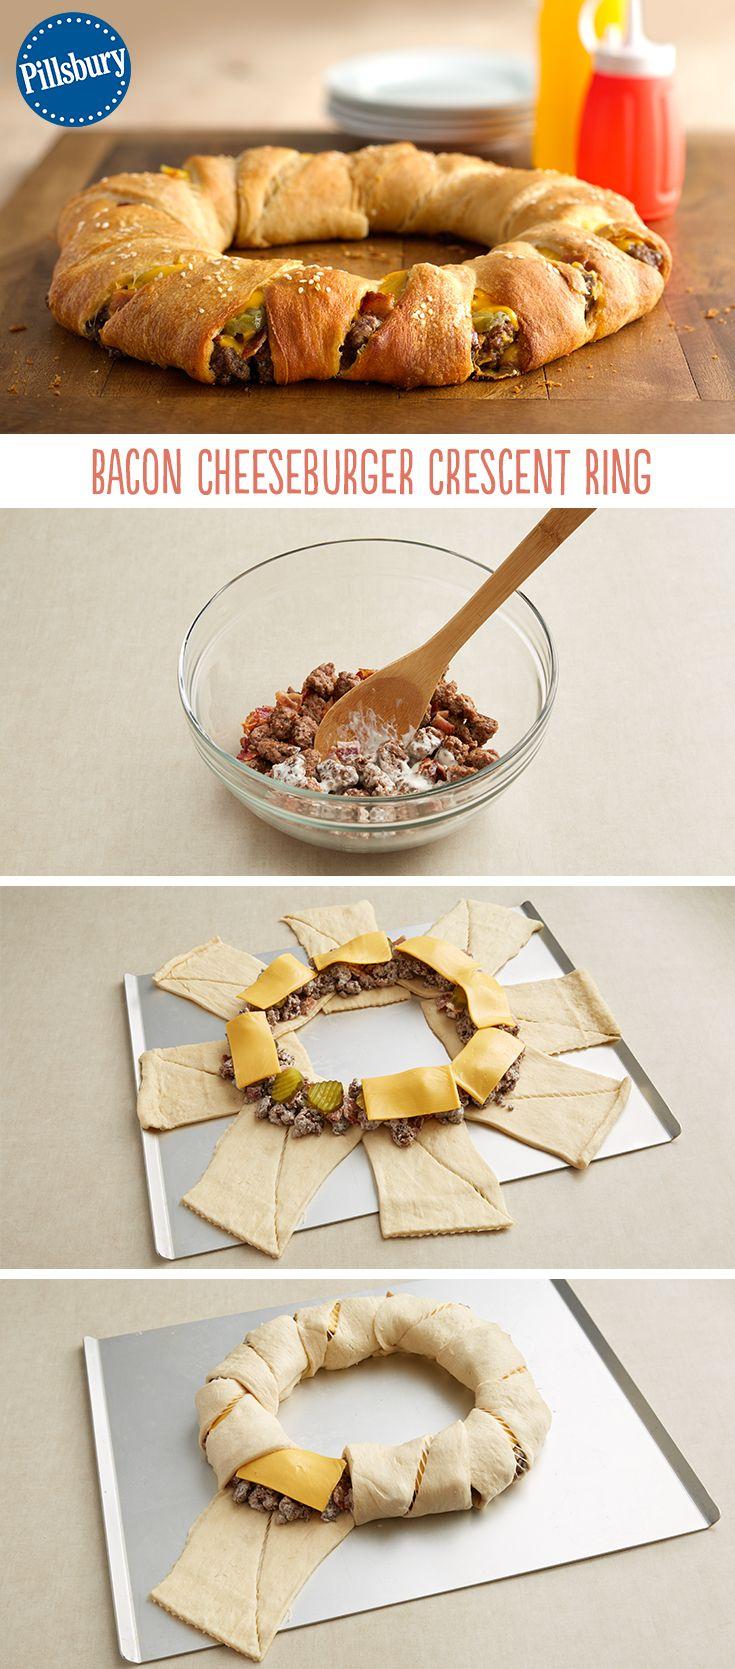 Bacon Cheeseburger Crescent Ring Recipe Food Bacon Cheeseburger Recipes